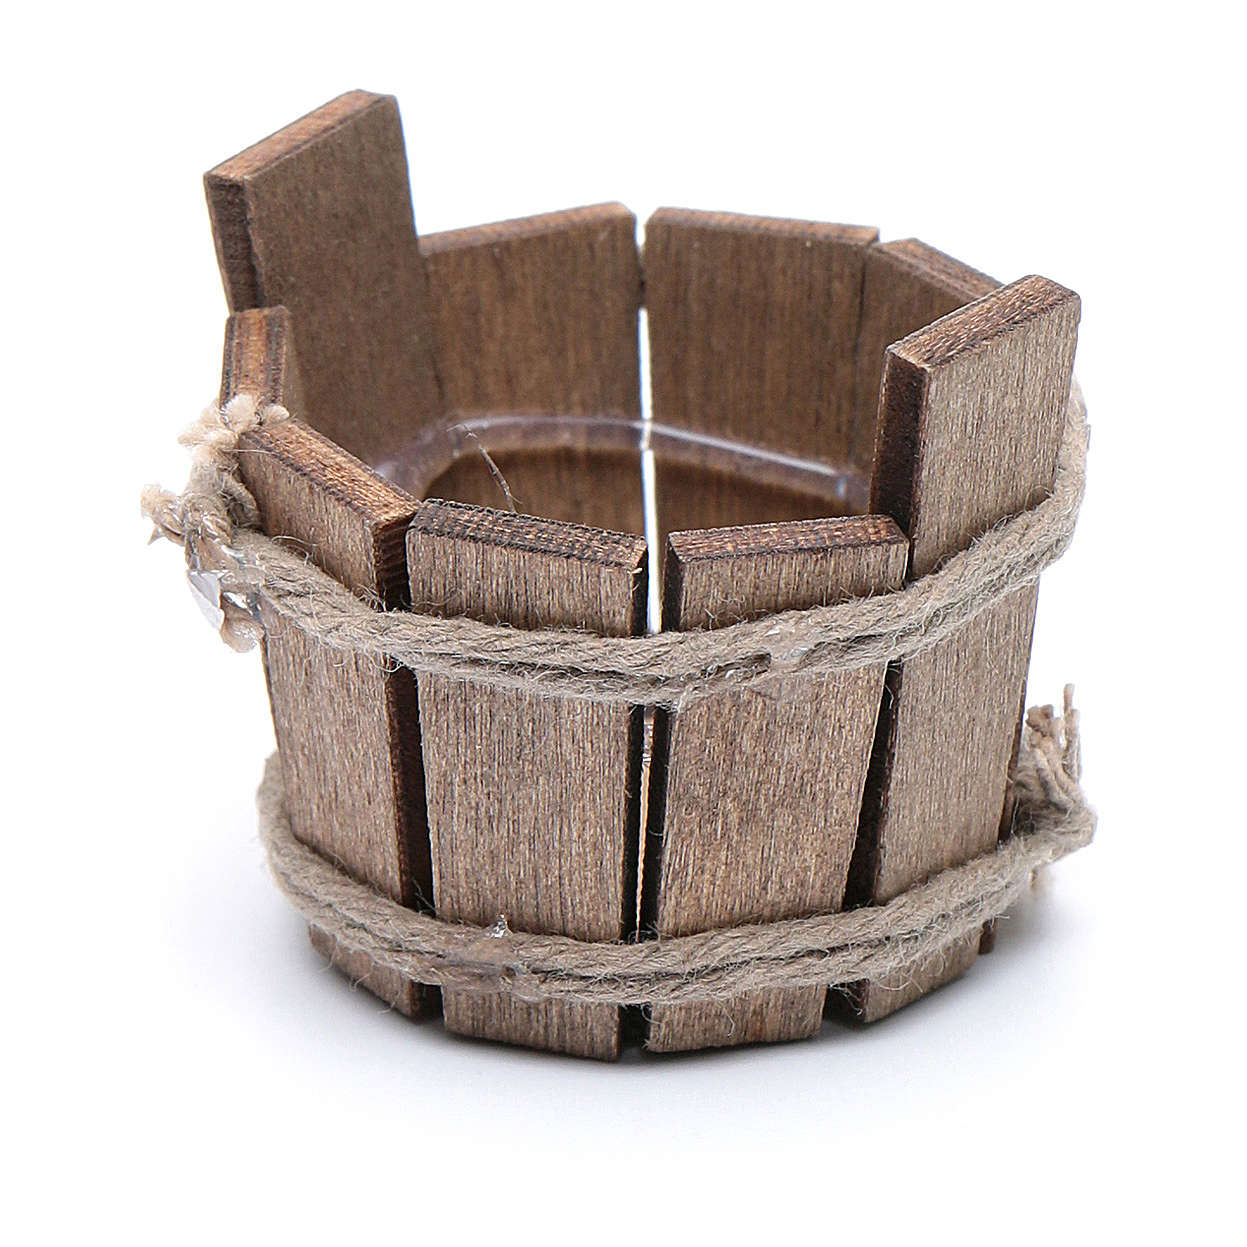 Tino in legno 2,5x3 cm presepe fai da te 4